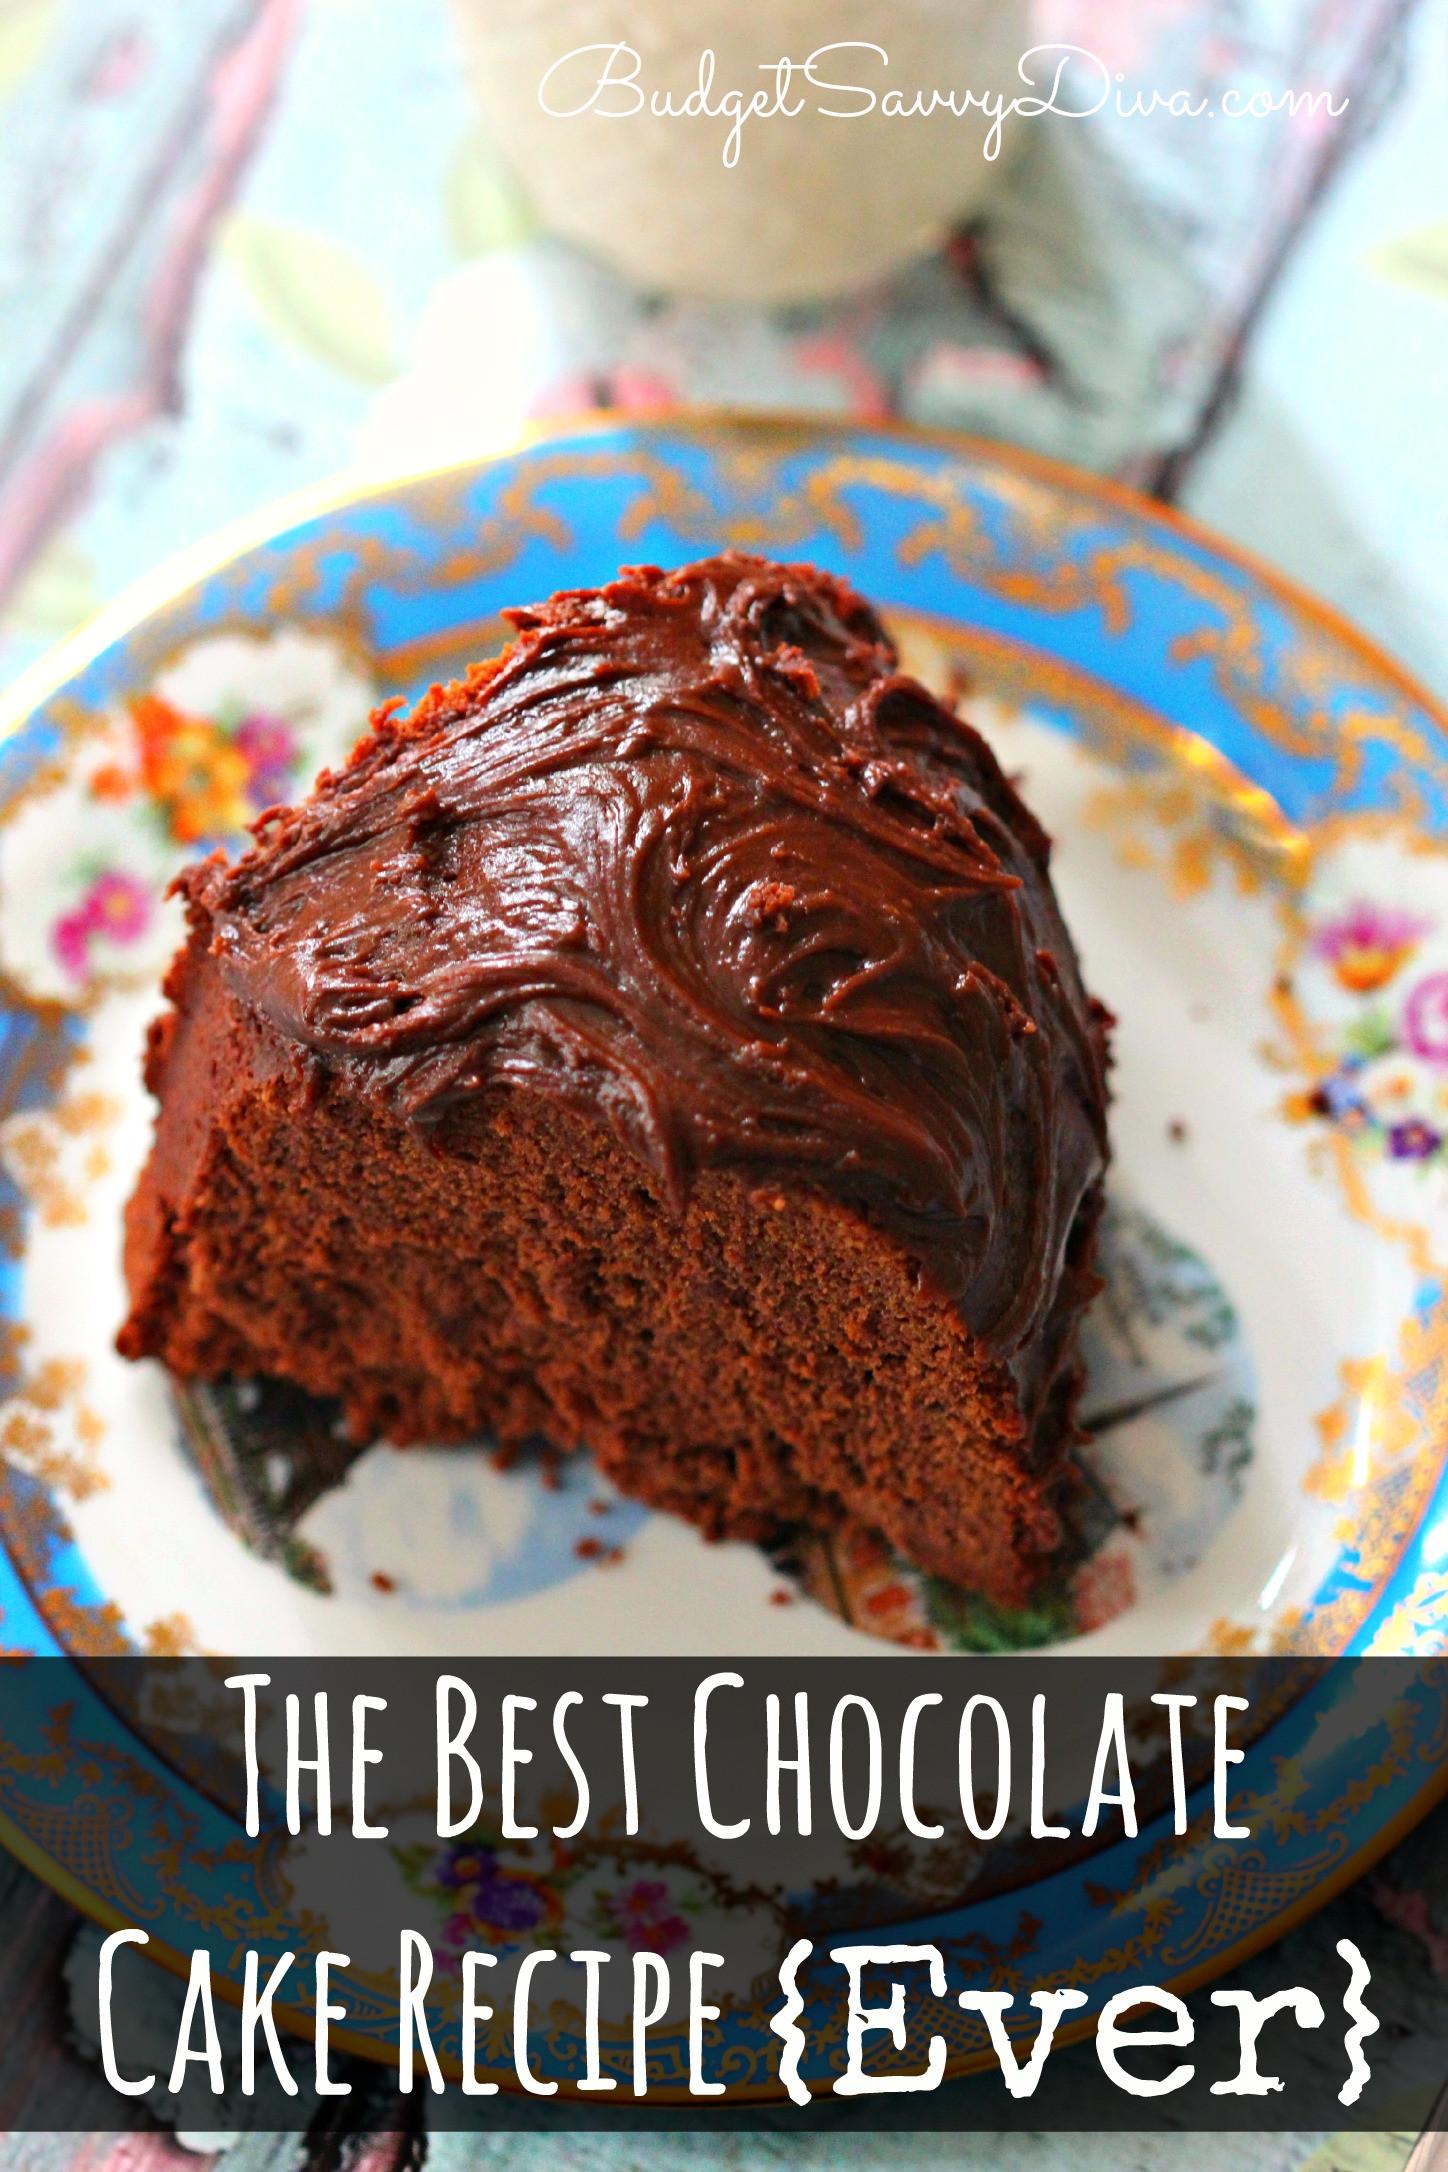 Chocolate Cake Mix Recipes  The Best Chocolate Cake Recipe Ever – Marie Recipe